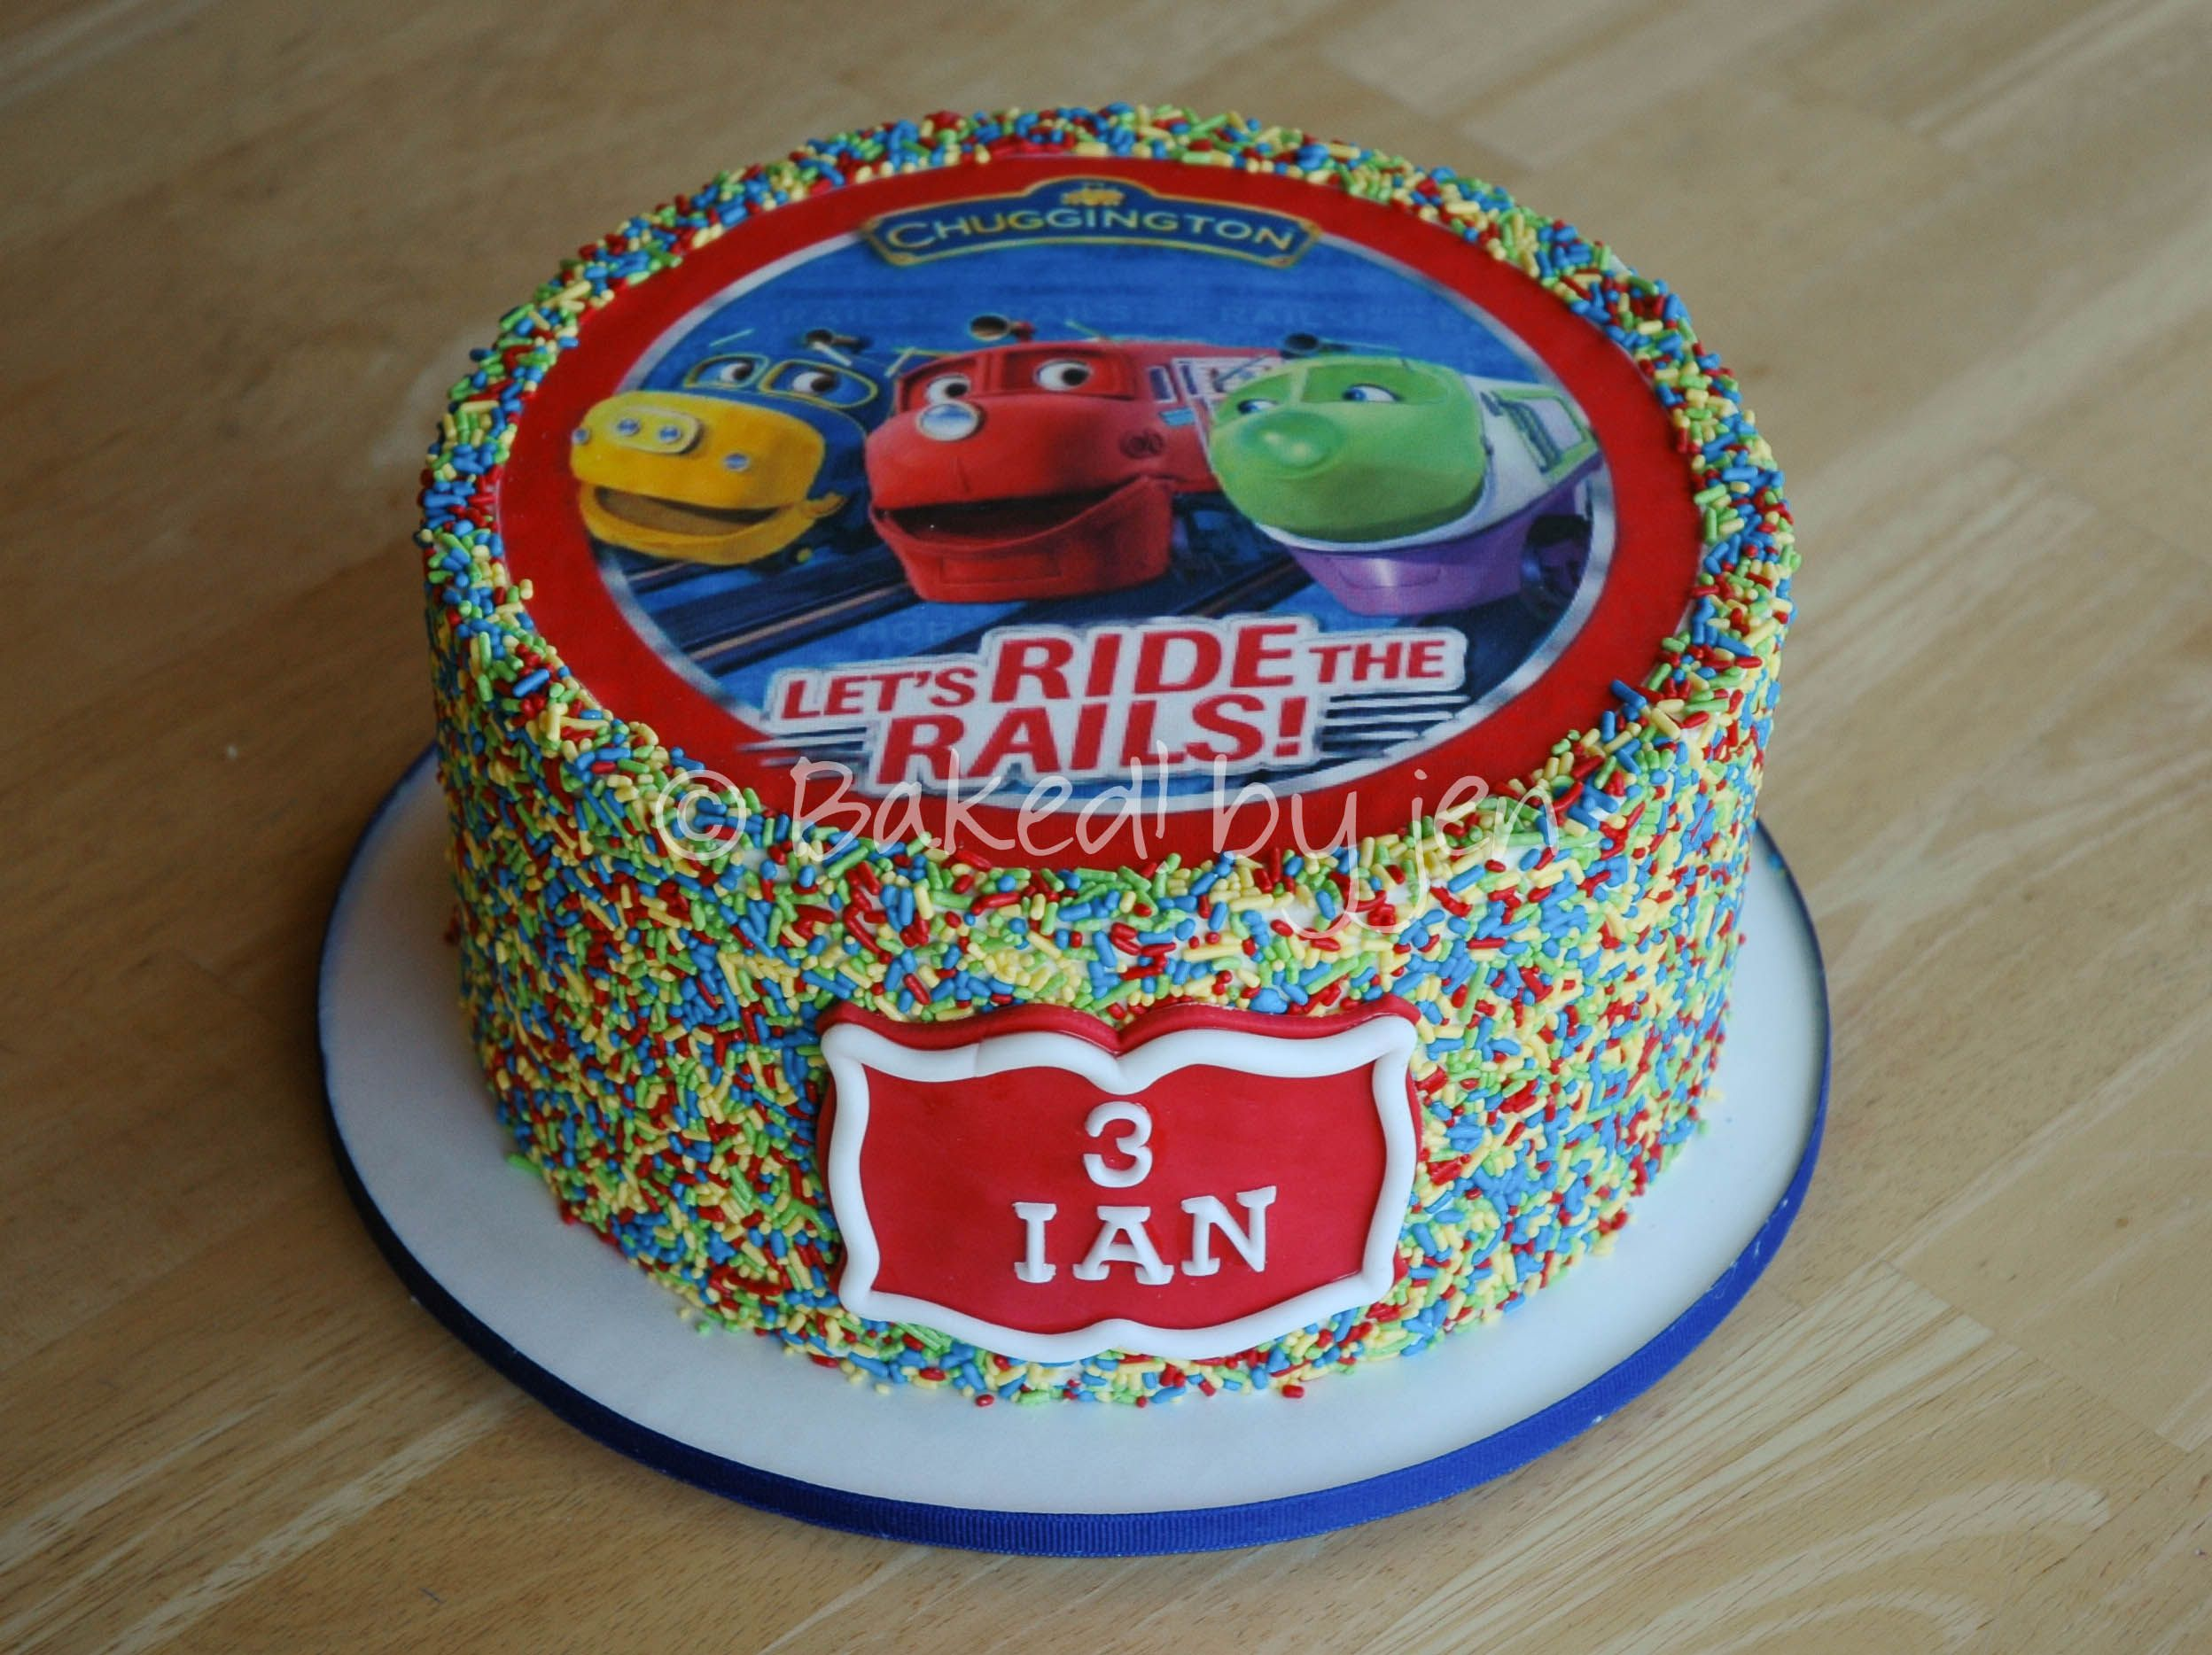 Sprinkles Chuggington birthday cake Baked by jen 2014